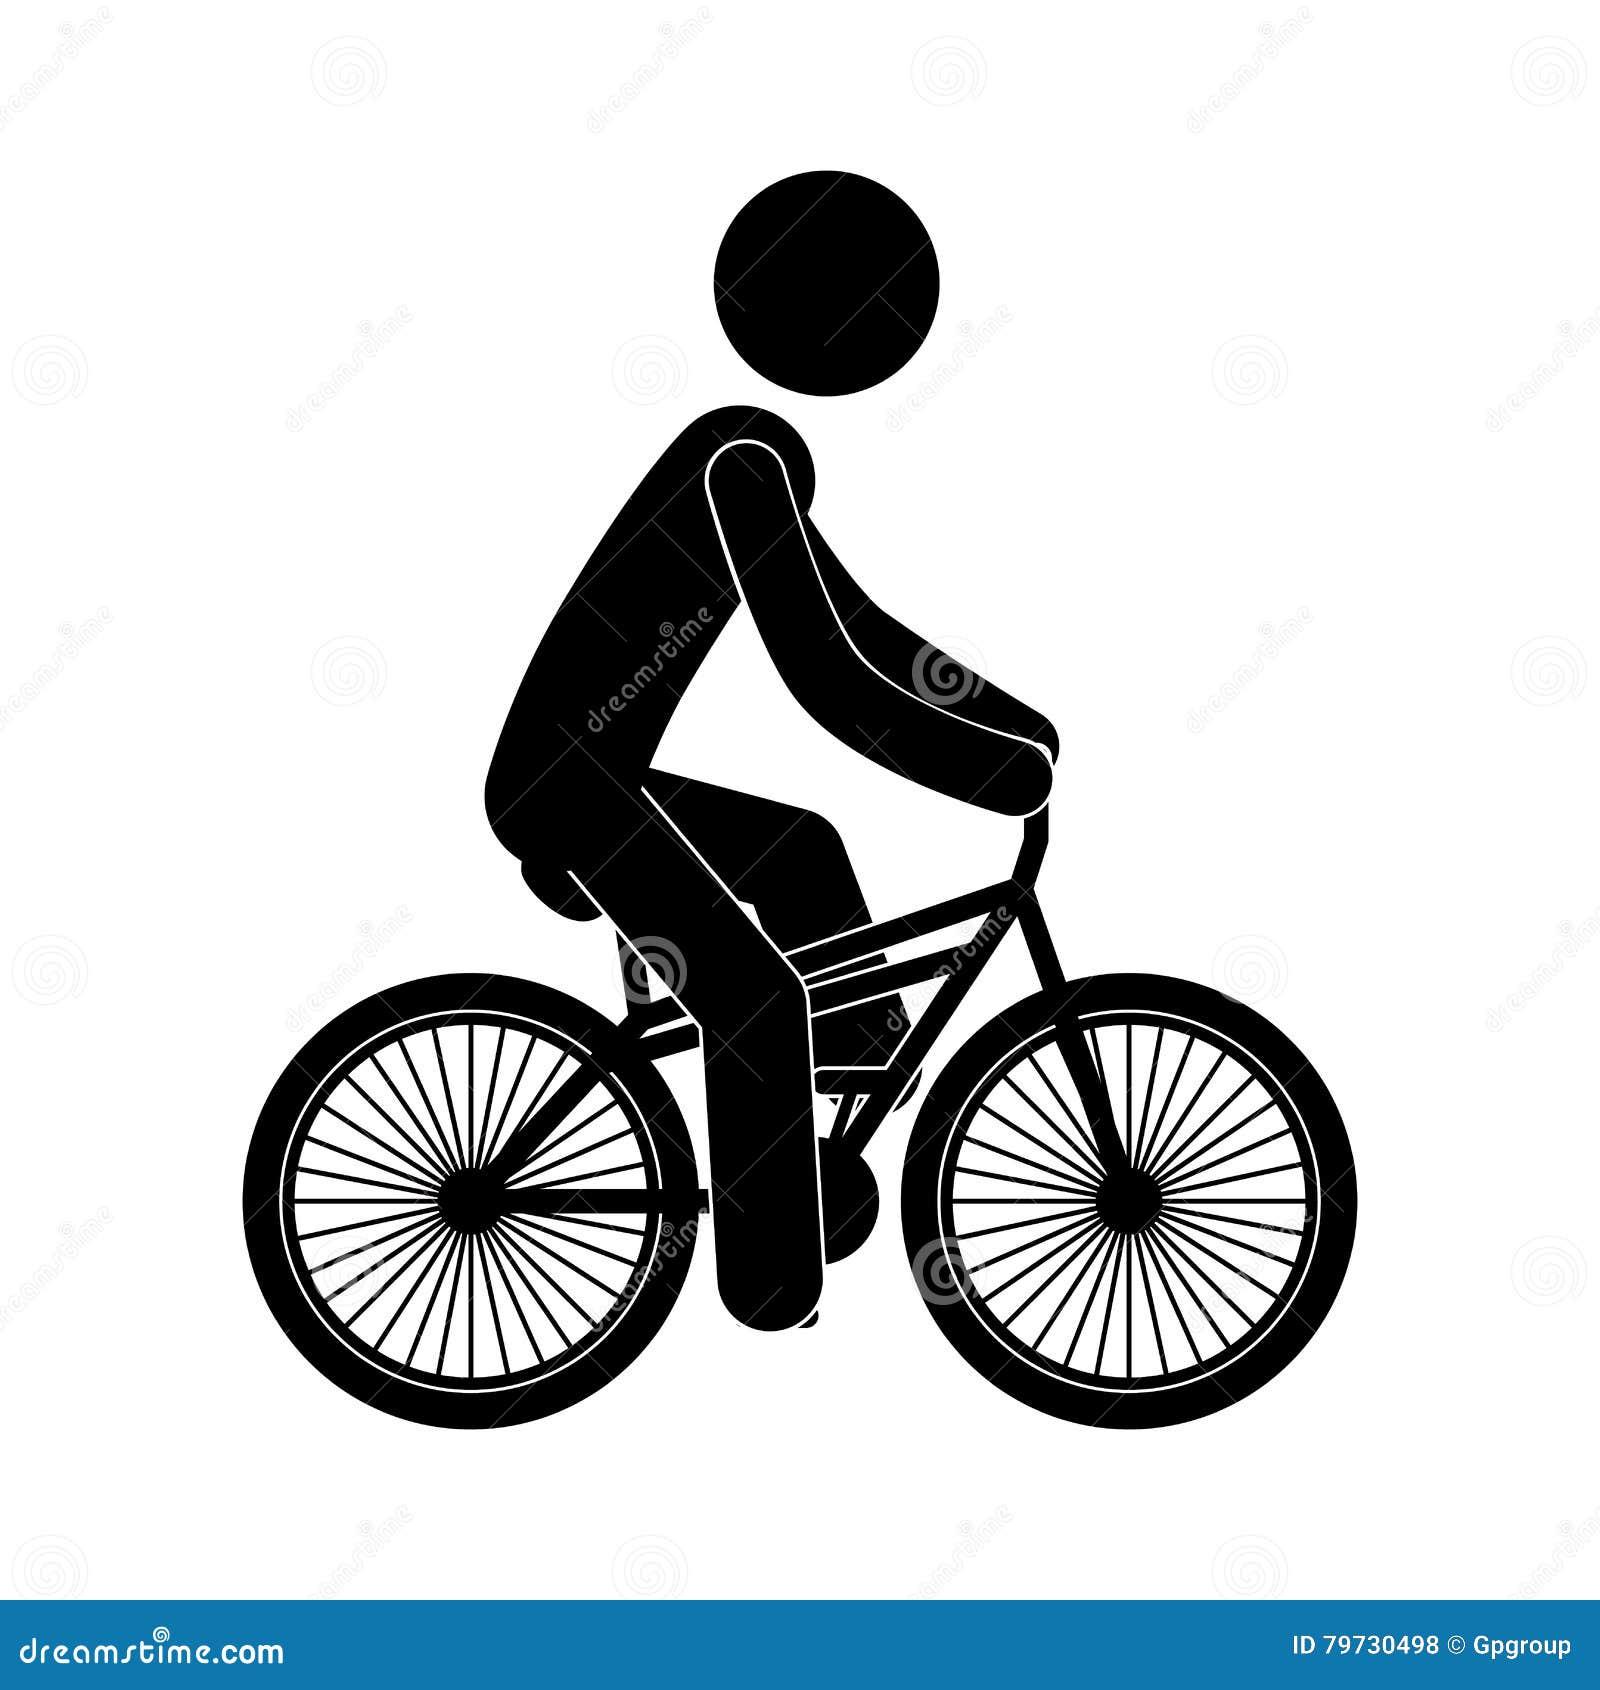 Persona negra de la silueta en bicicleta